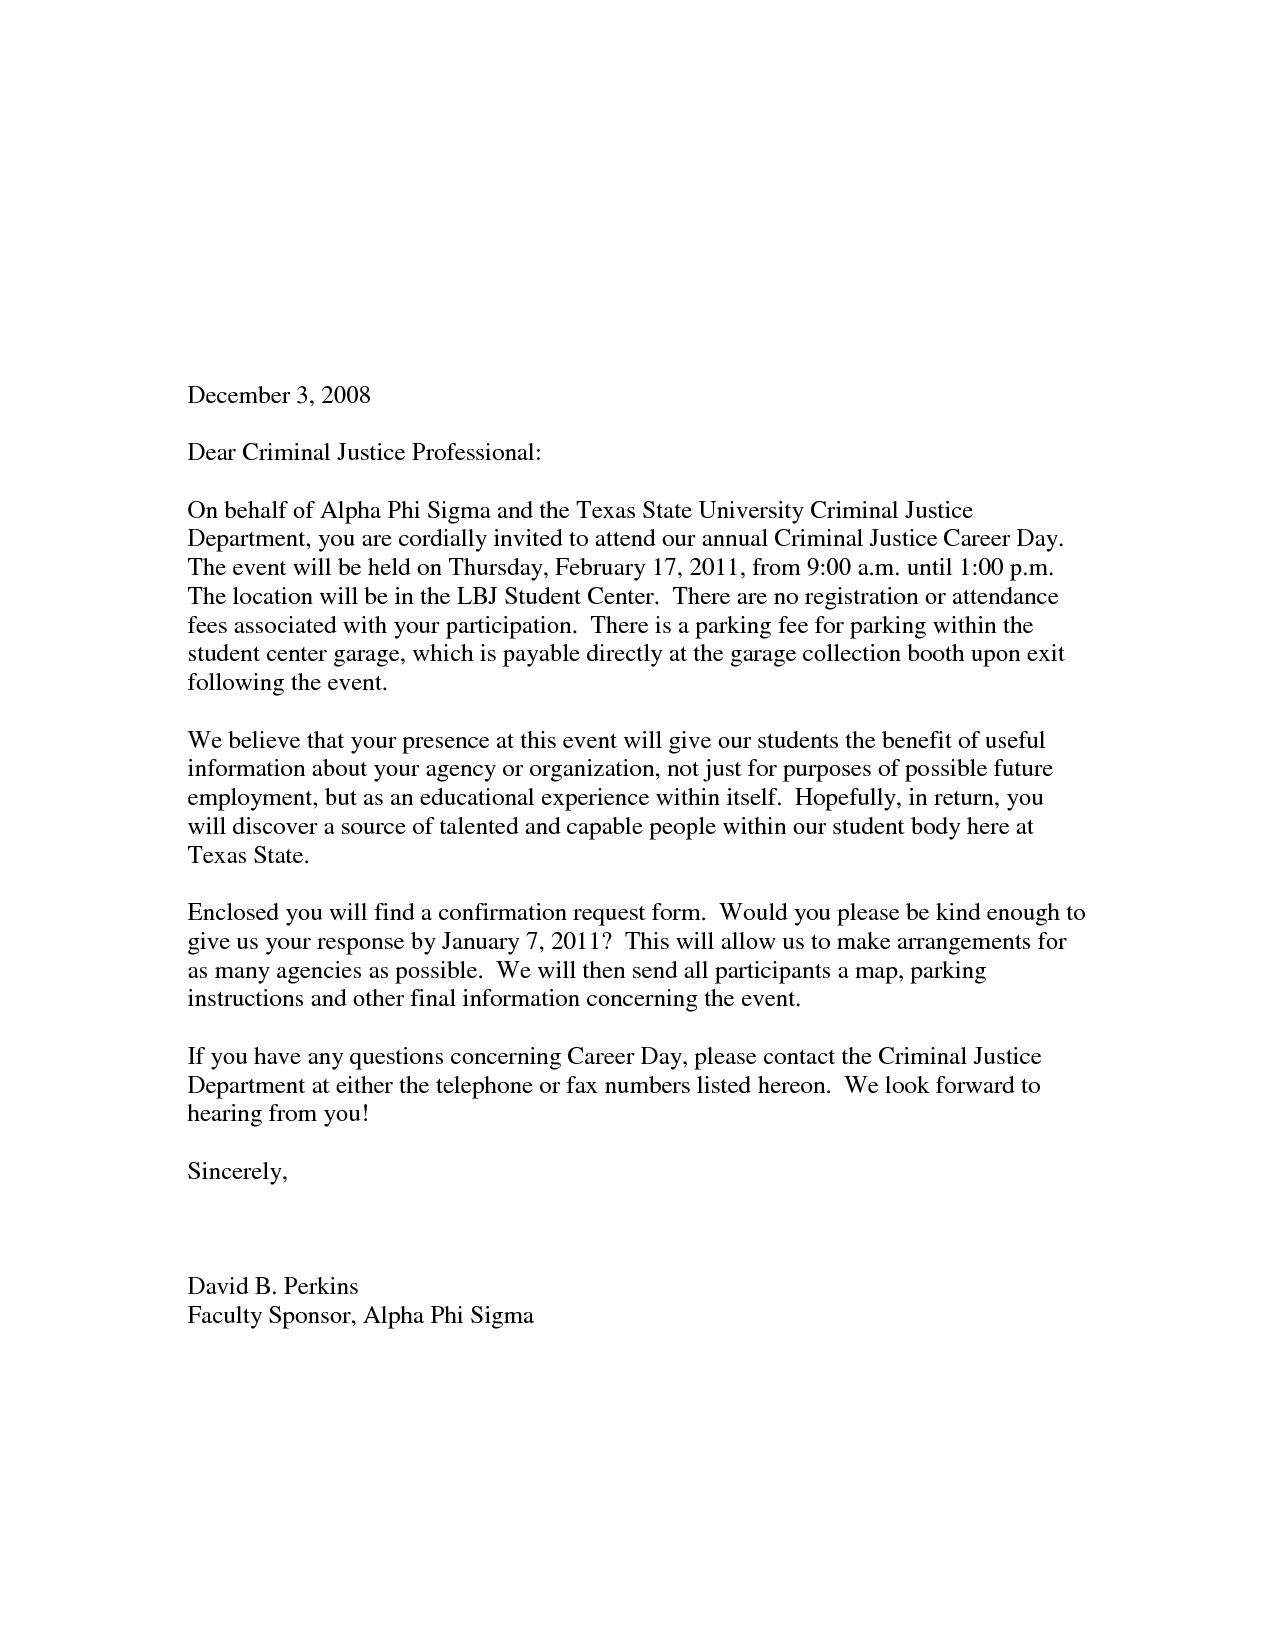 Sample Career Day Invitation Letter School Yolanda Blogformal Template Business